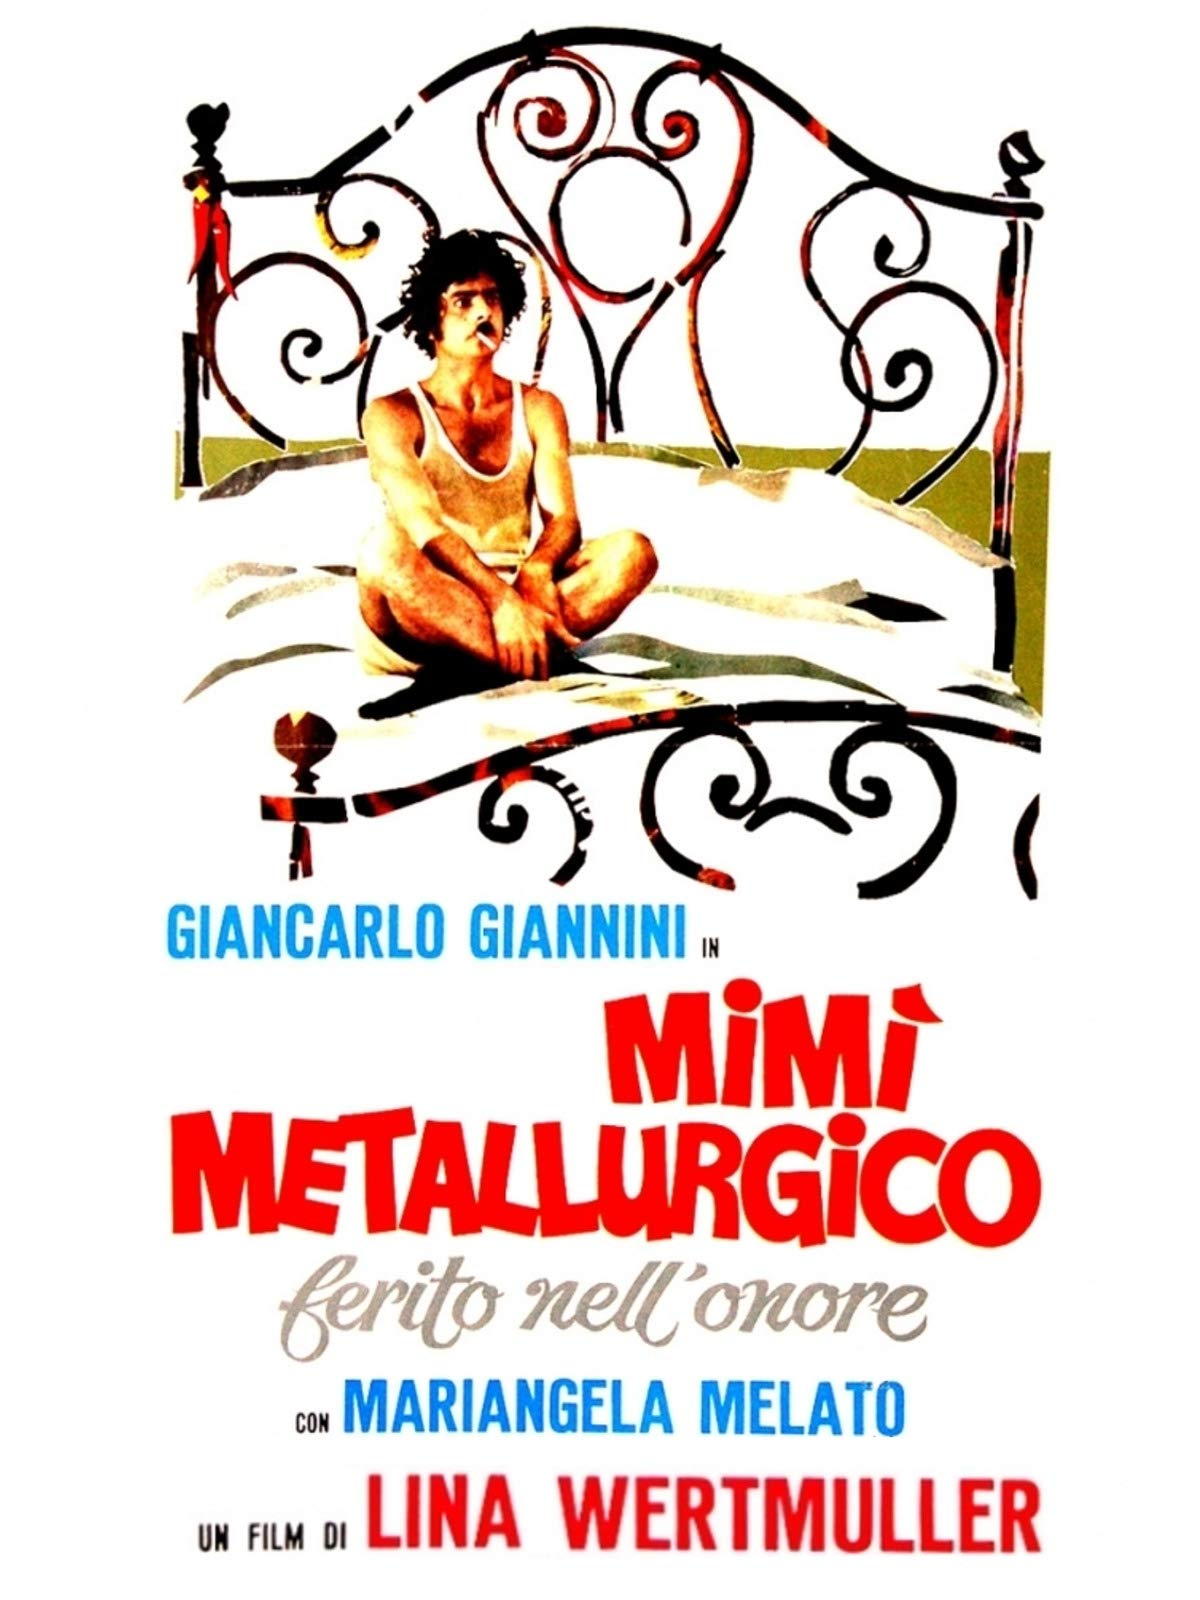 The Seduction of Mimì